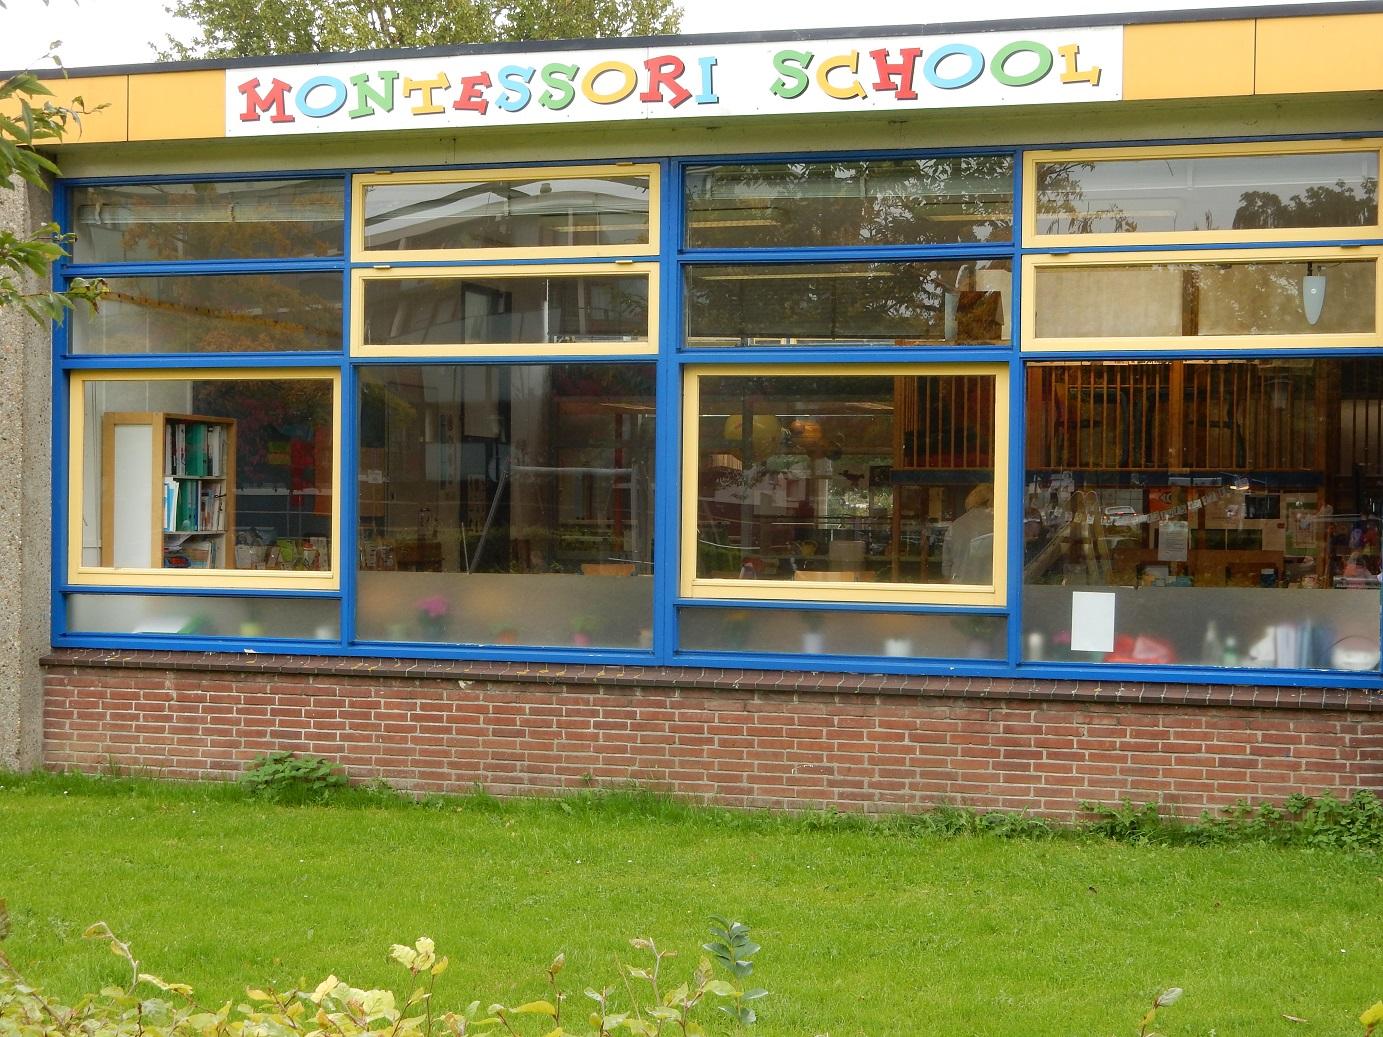 Montessorischool2